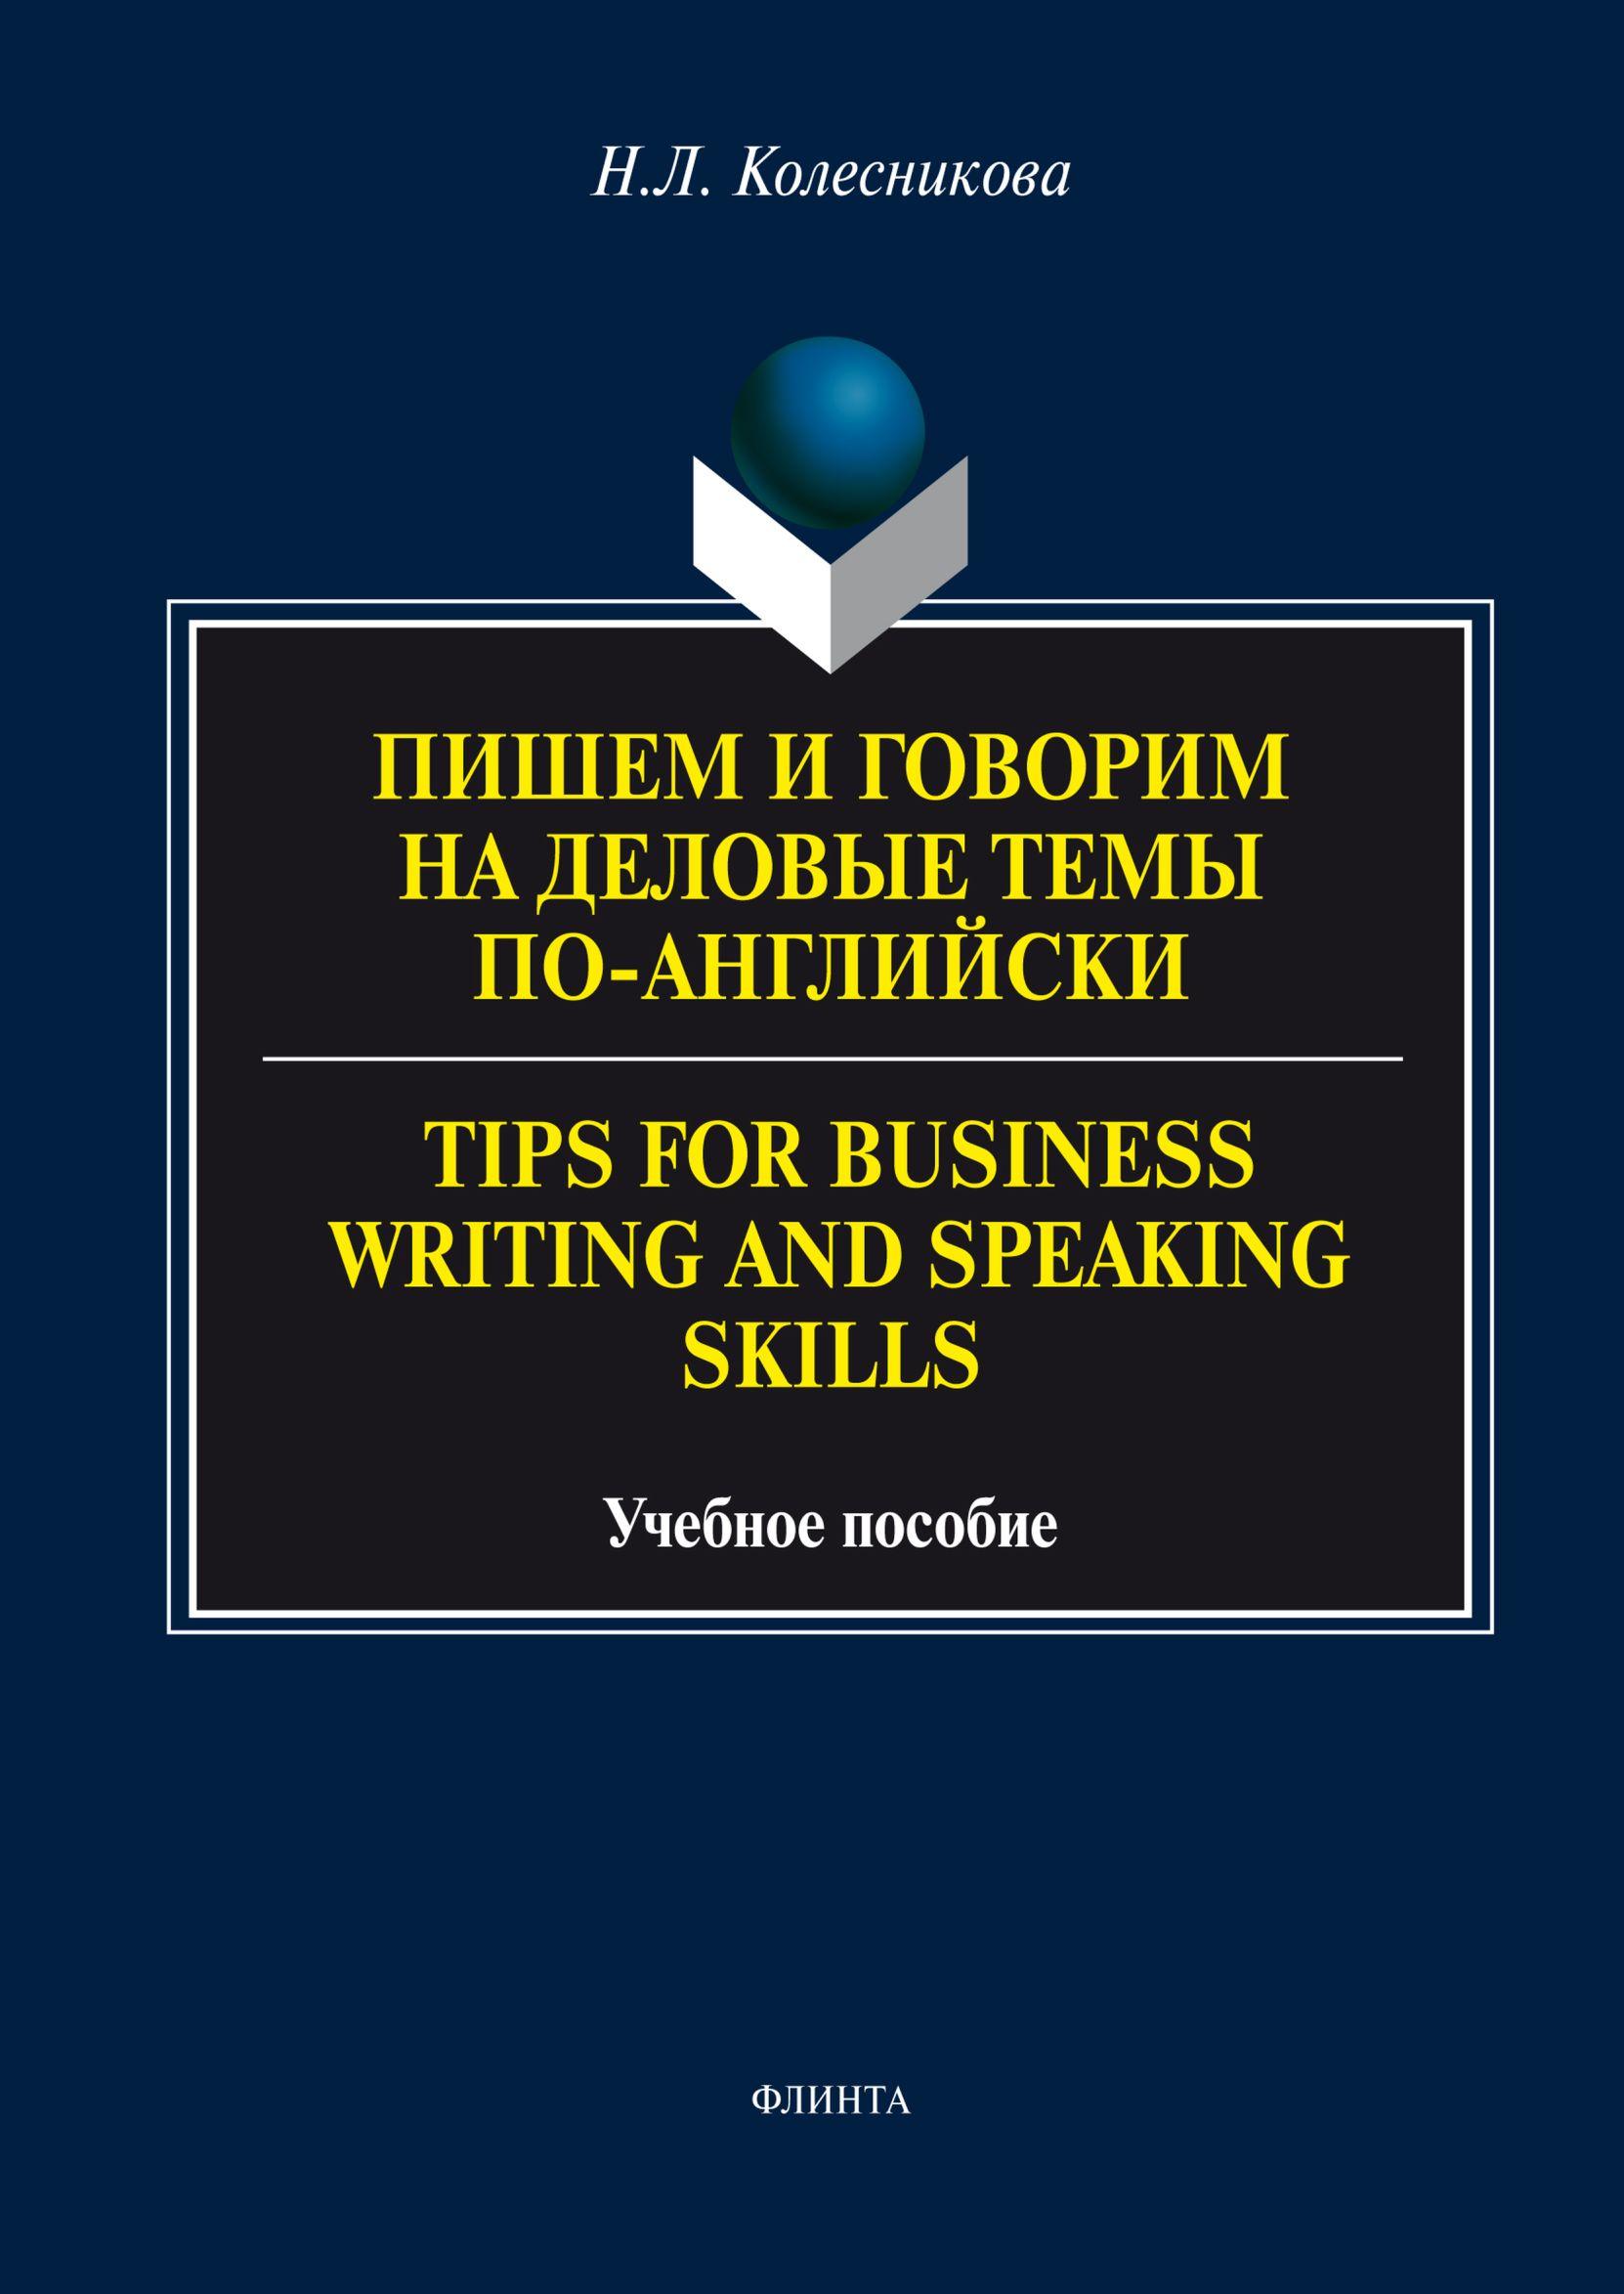 Пишем и говорим на деловые темы по-английски / Tips for Business Writing and Speaking Skills ( Н. Л. Колесникова  )